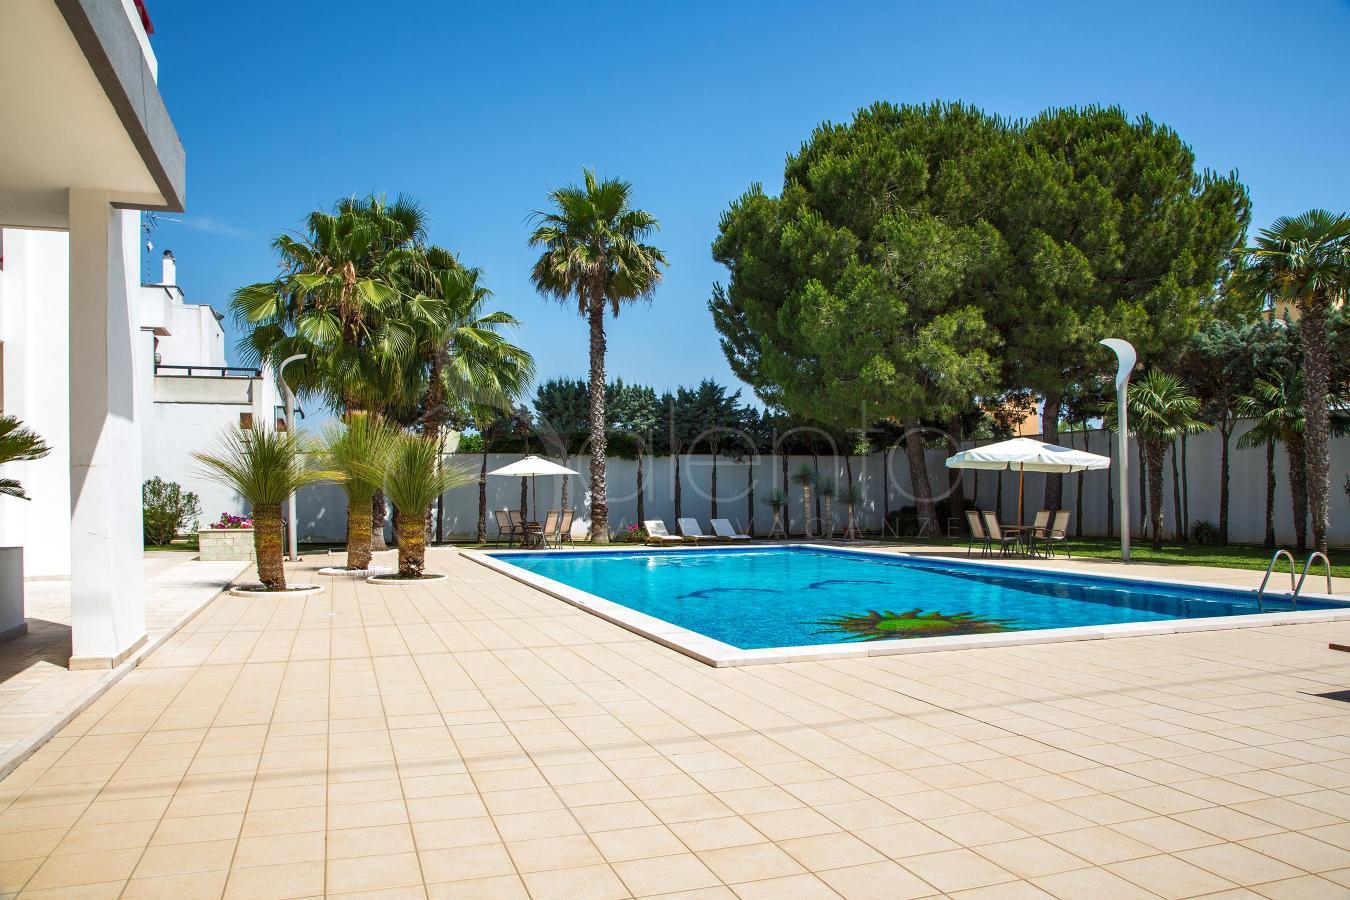 Casa con piscina per vacanze nel salento dependance in - Villa con piscina salento ...